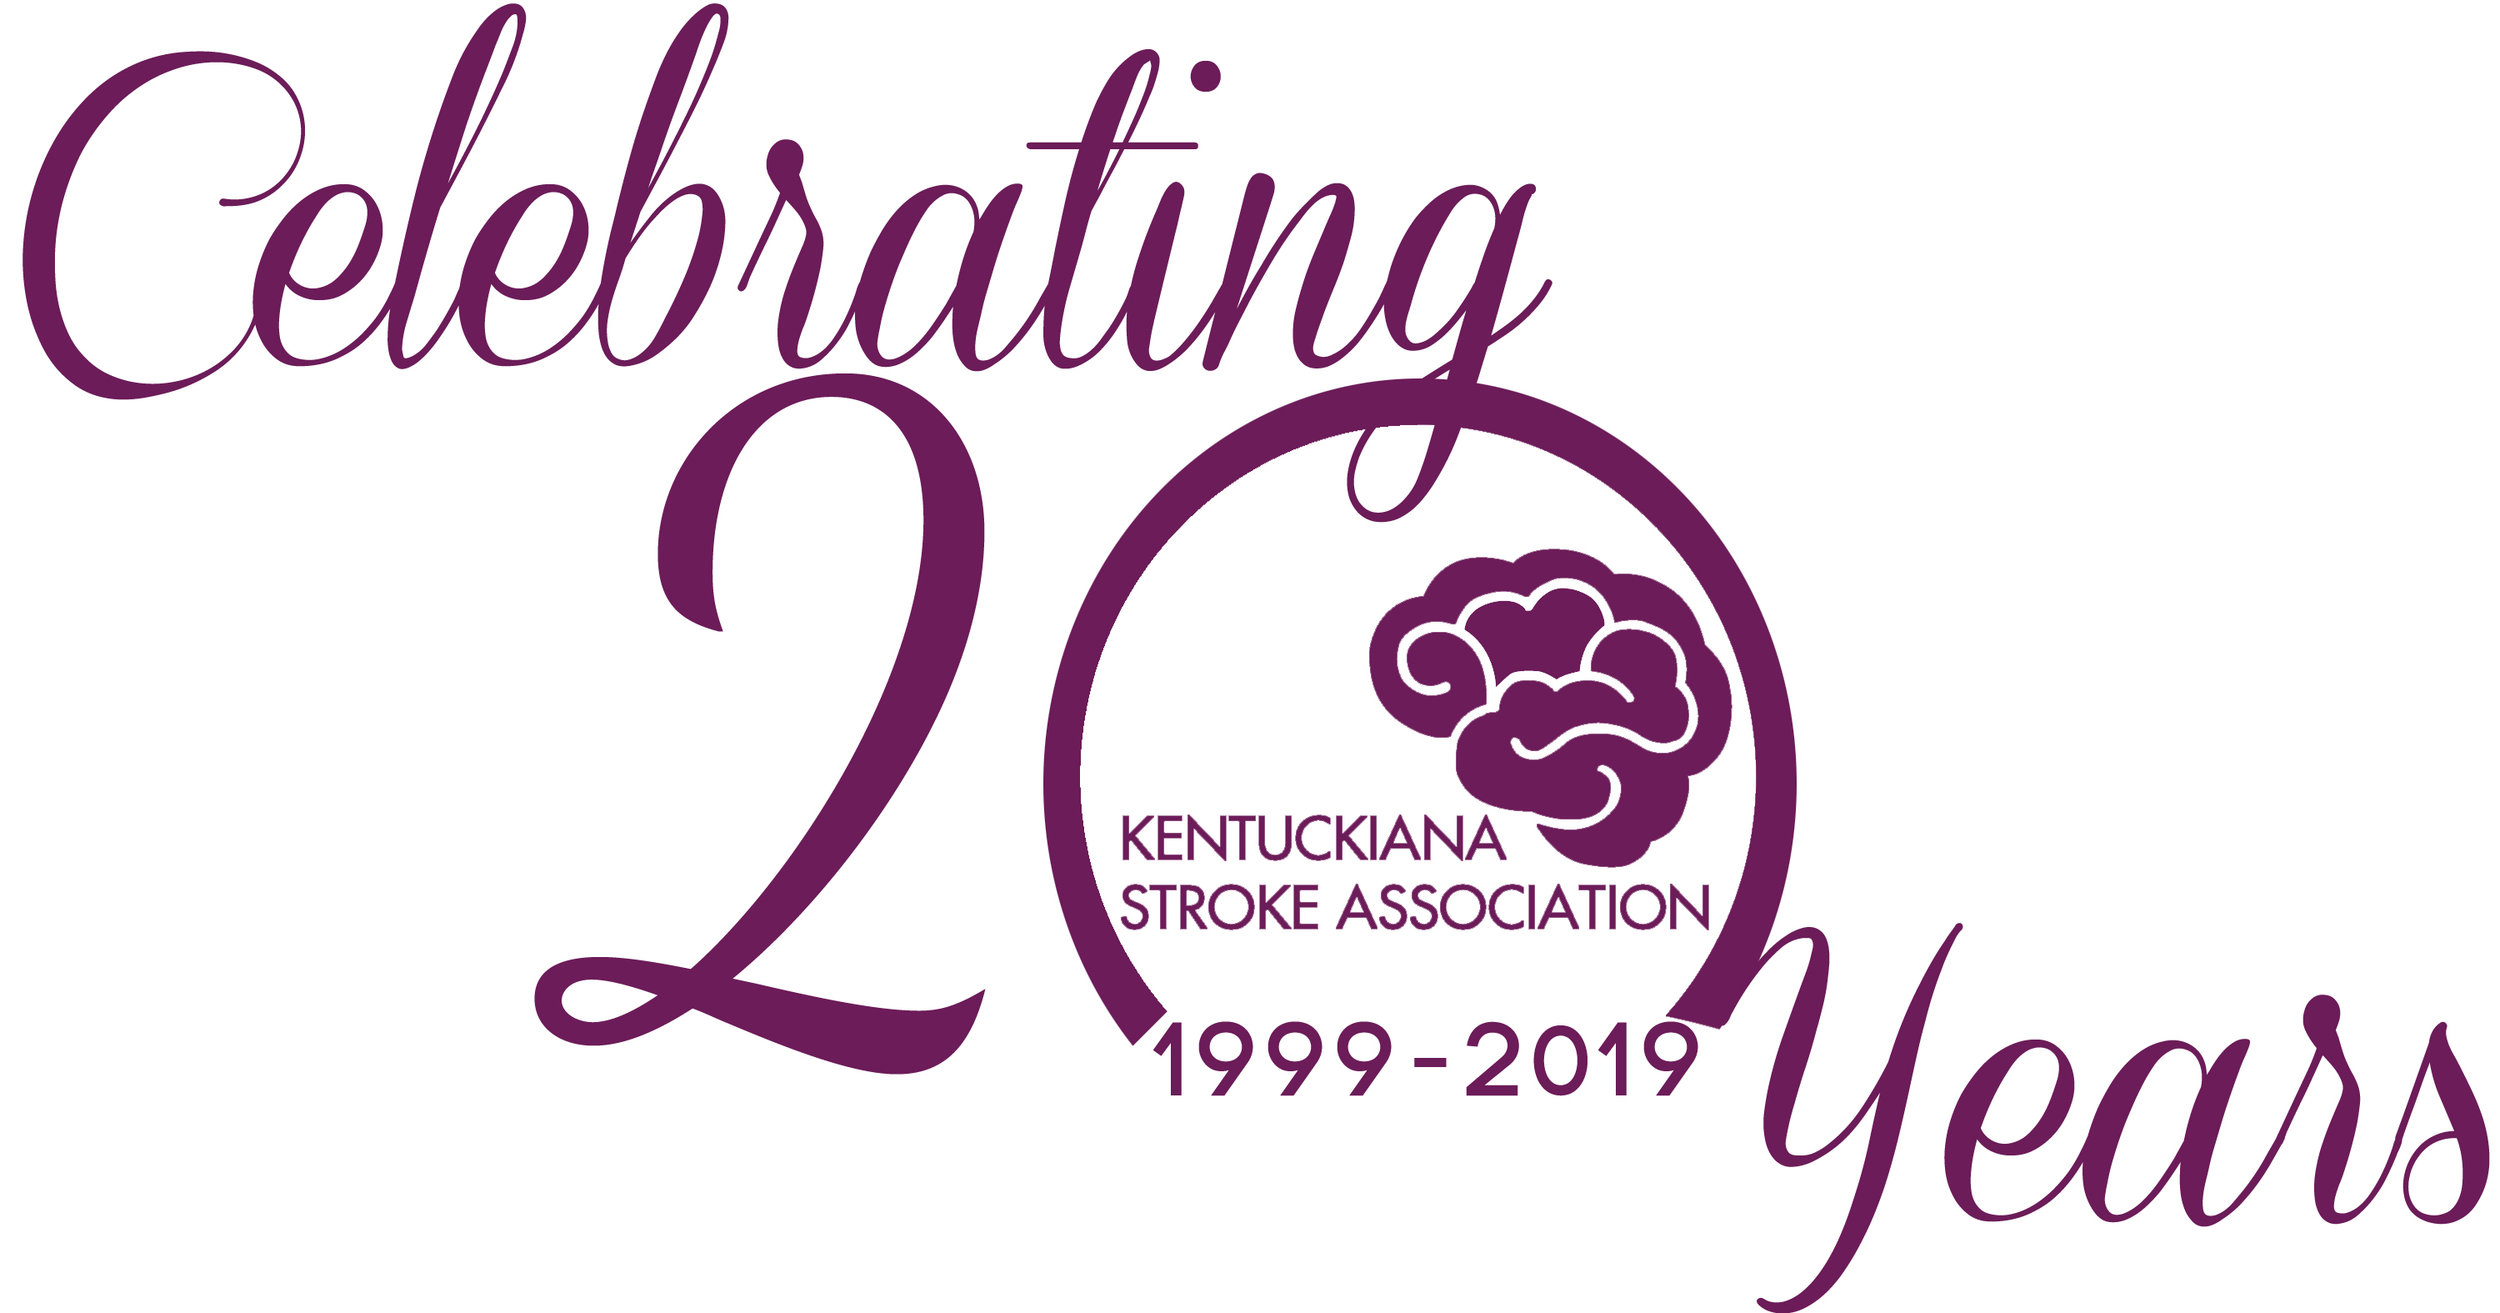 Celebrating20years_2019_Official_Logo.jpg